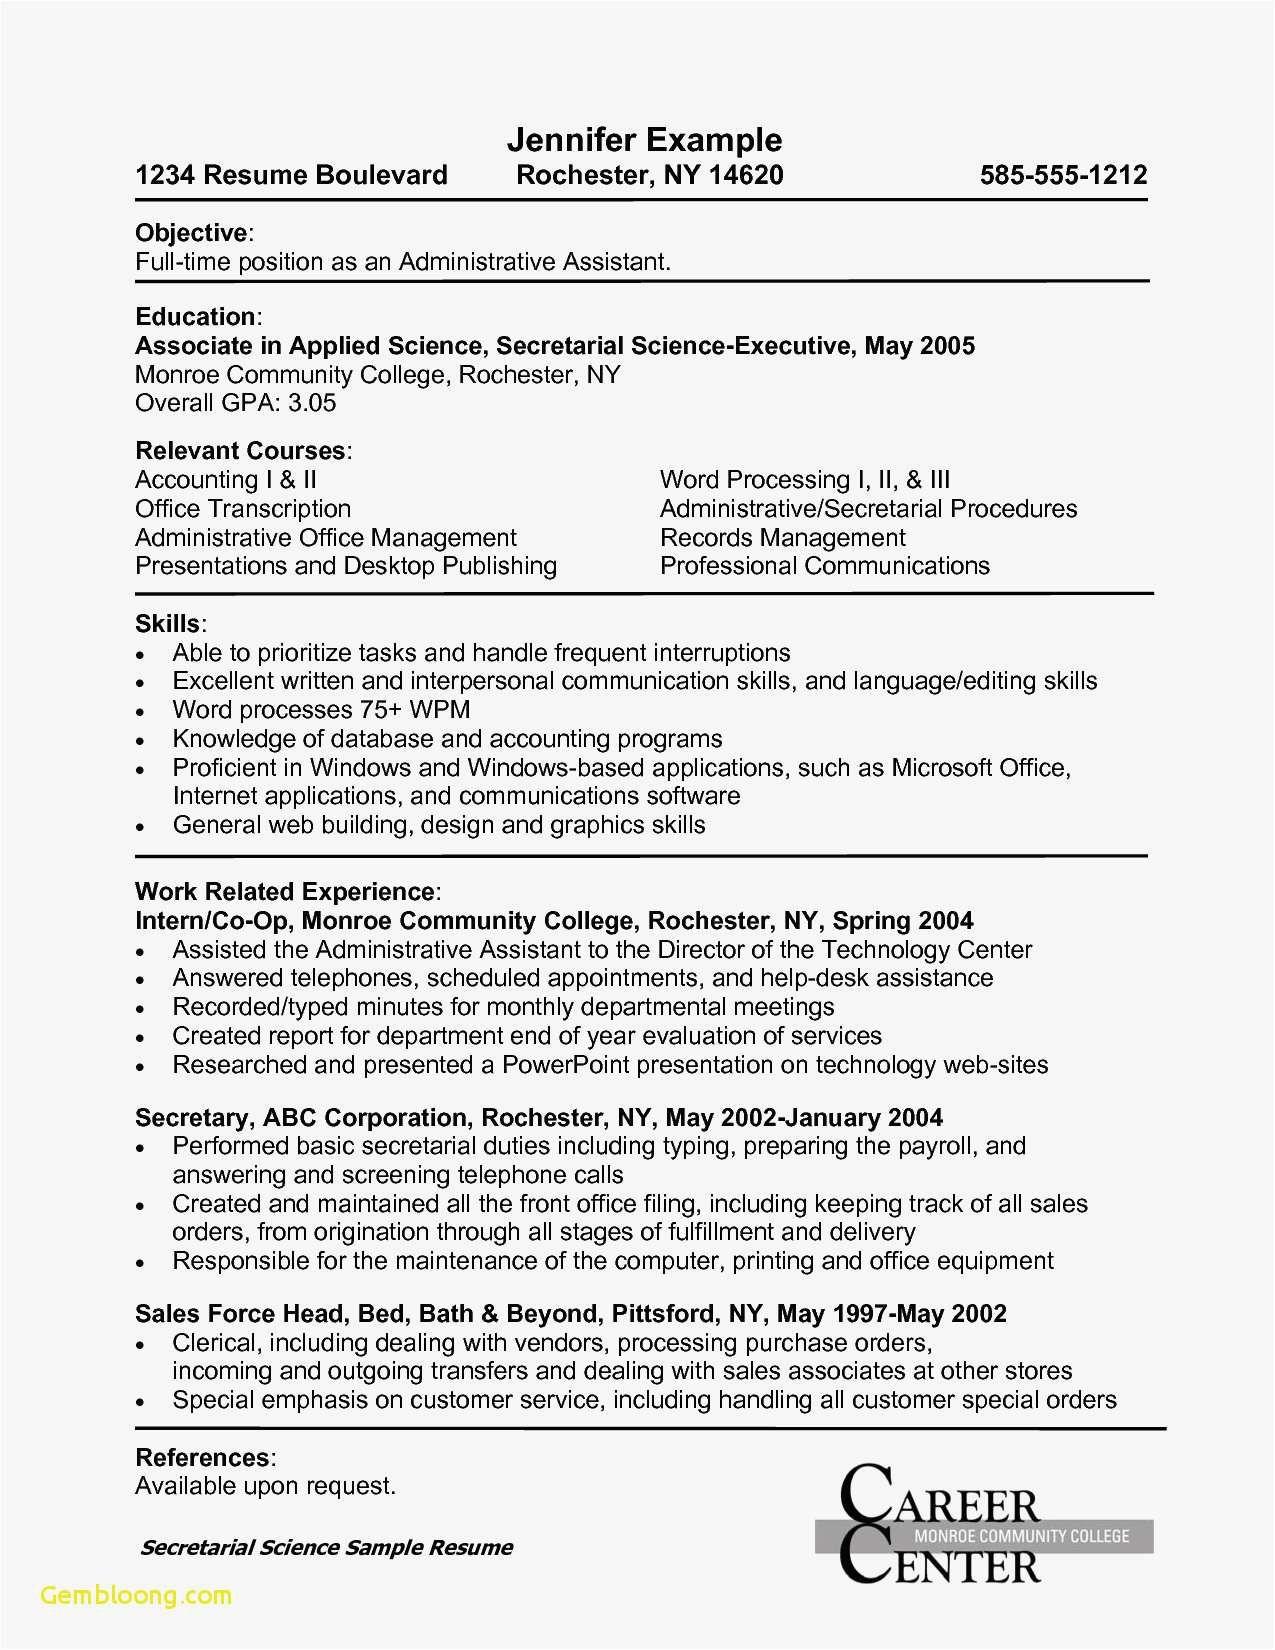 25 Sample Cover Letter For Administrative Assistant Administrative Assistant Resume Resume Objective Examples Resume Objective